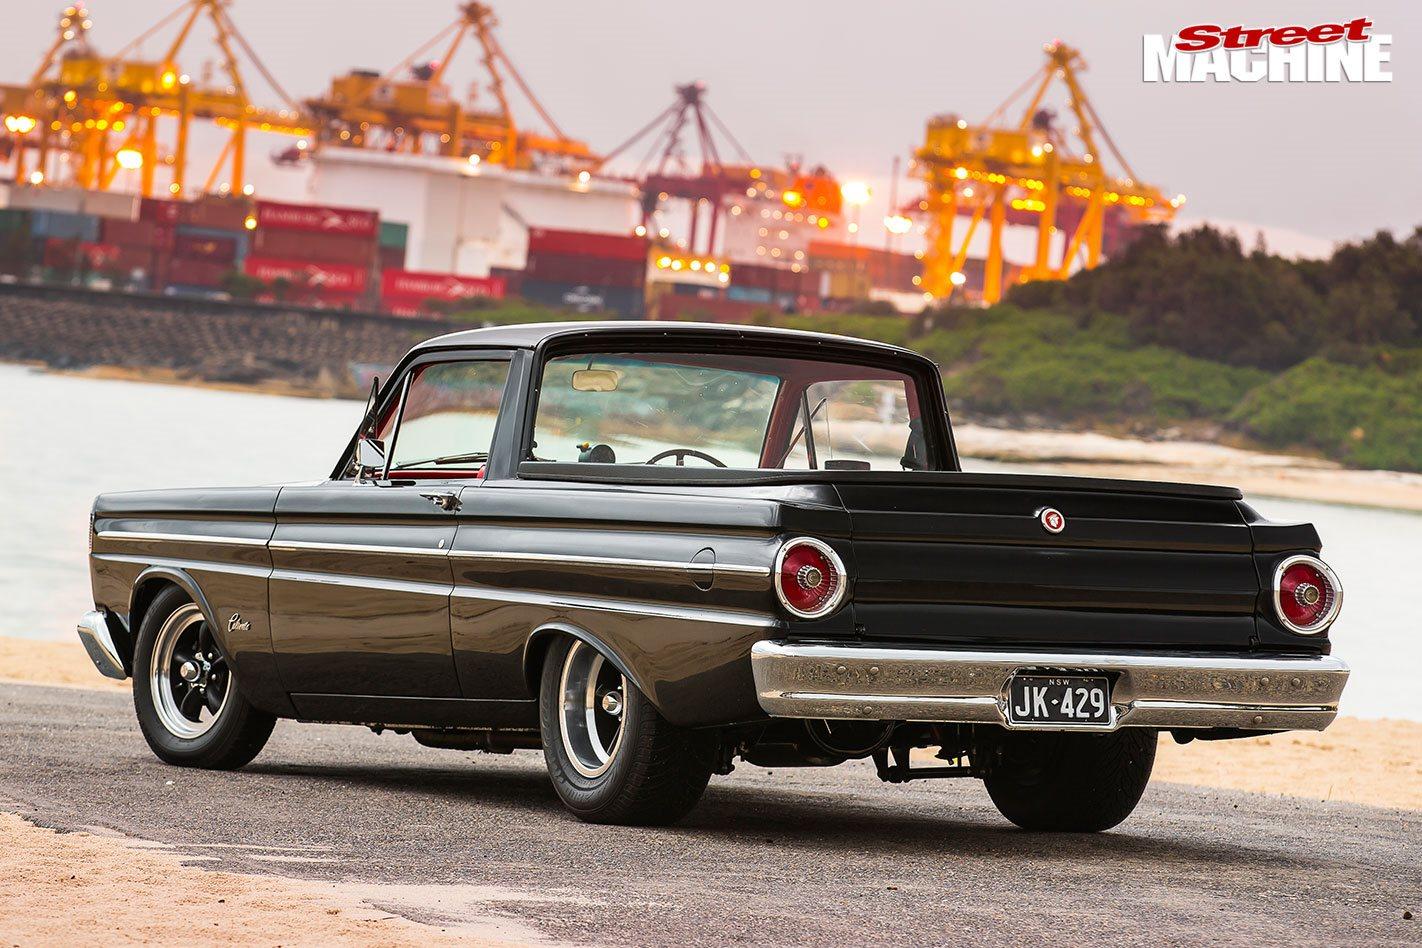 Twin-turbo 1964 Mercury Comet/Ford Ranchero hybrid